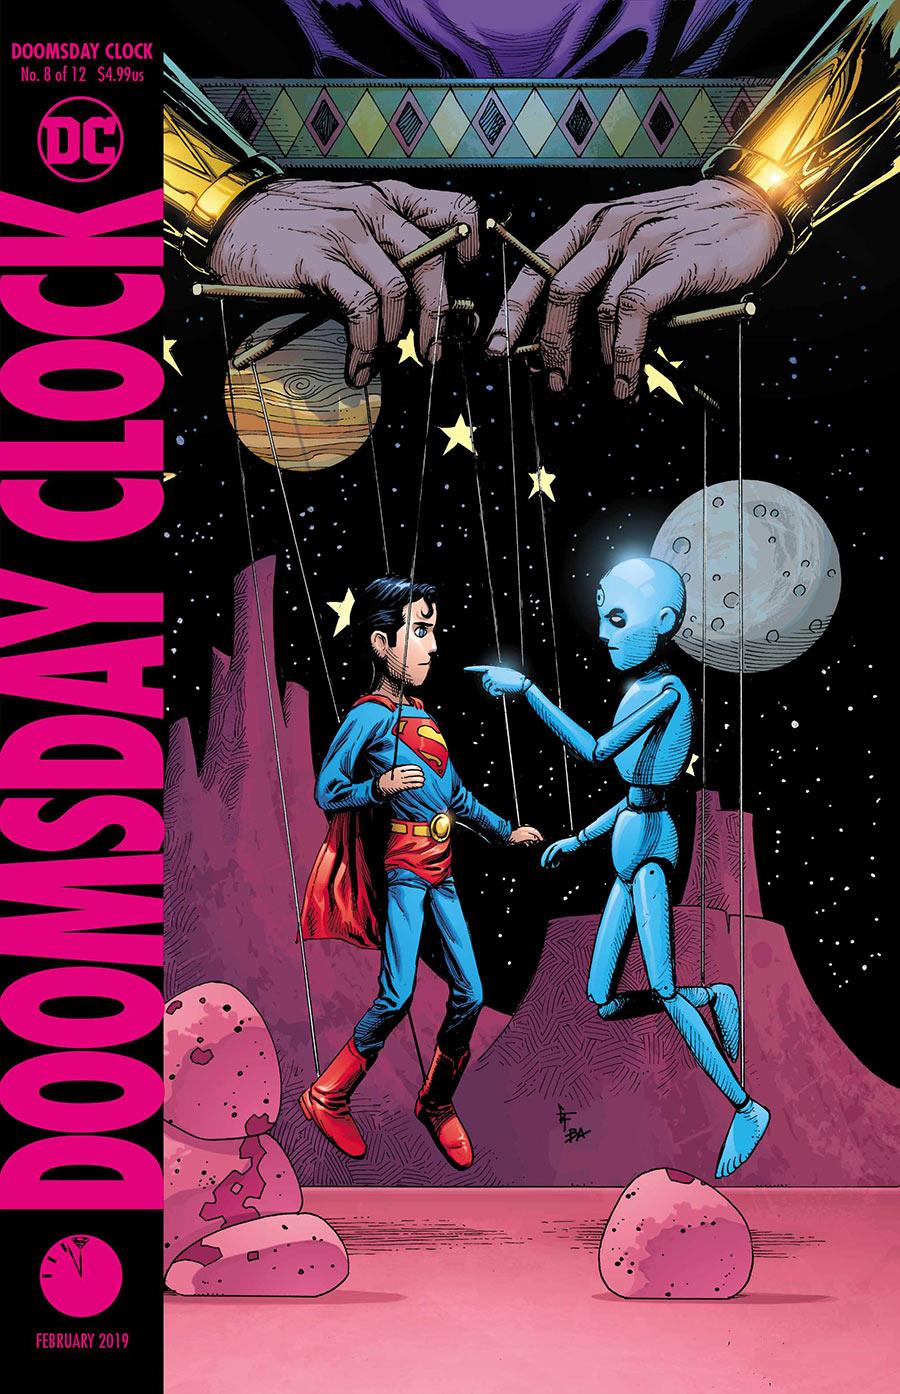 Doomsday Clock 8 - Cover 2 - DC Comics News